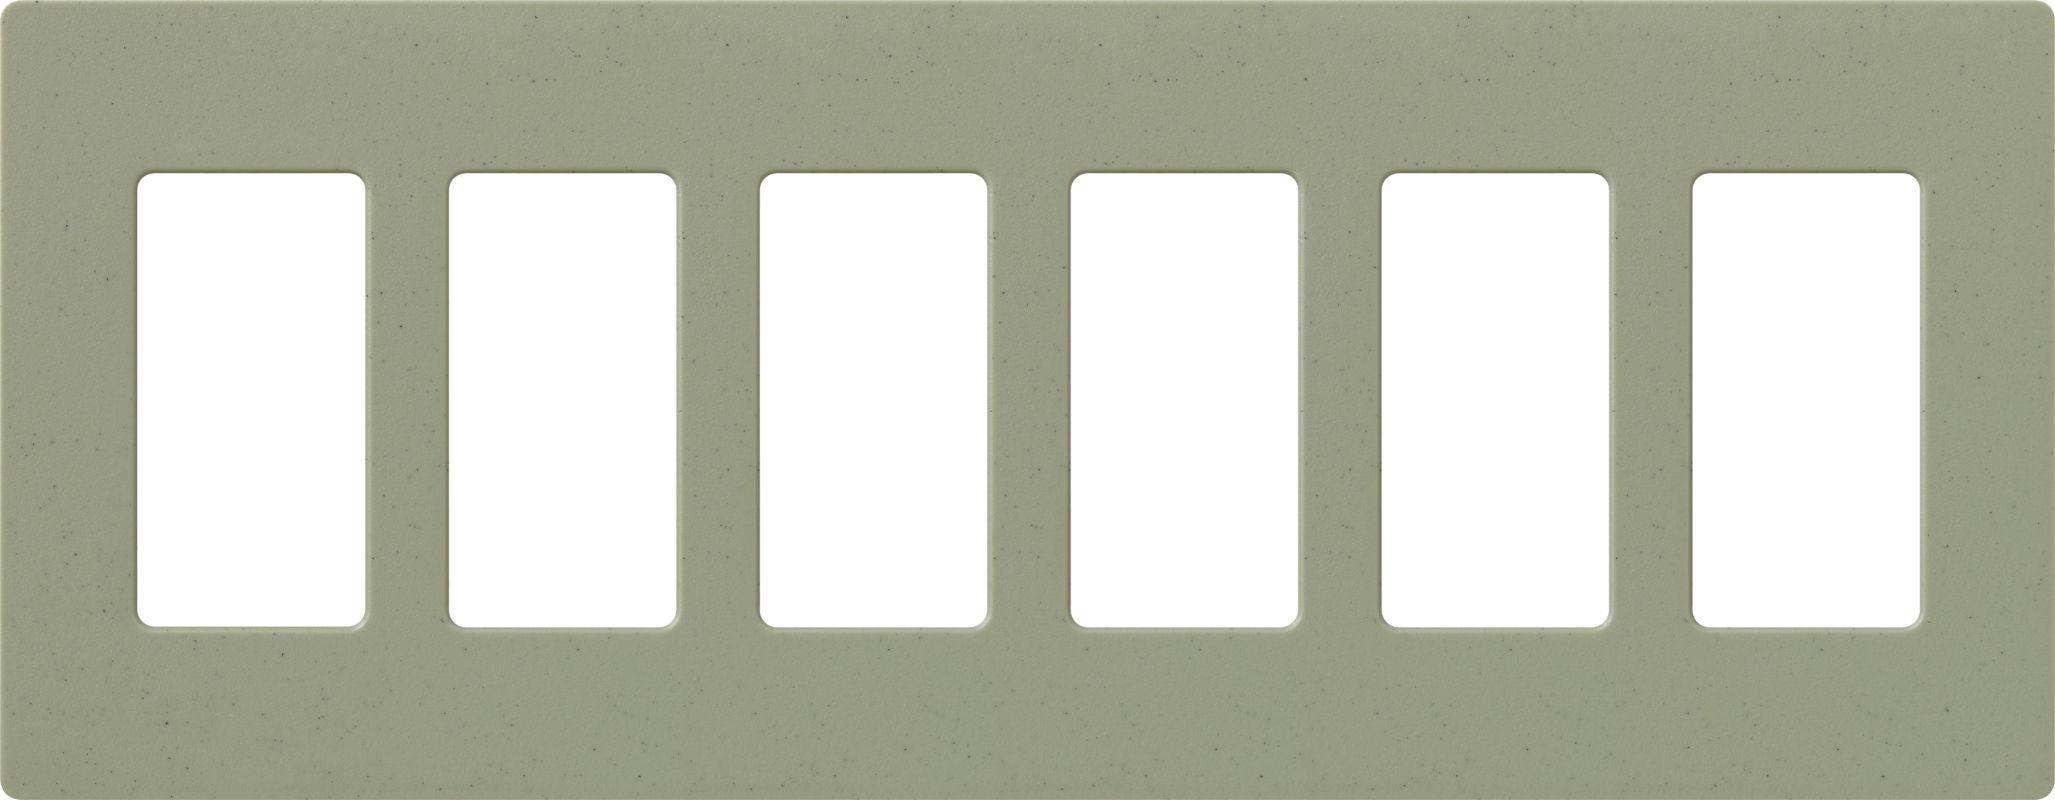 Lutron CW-6 Claro Six Gang Designer Wall Plate Greenbriar Wall Sale $59.75 ITEM: bci1856034 ID#:SC-6-GB UPC: 27557175845 :